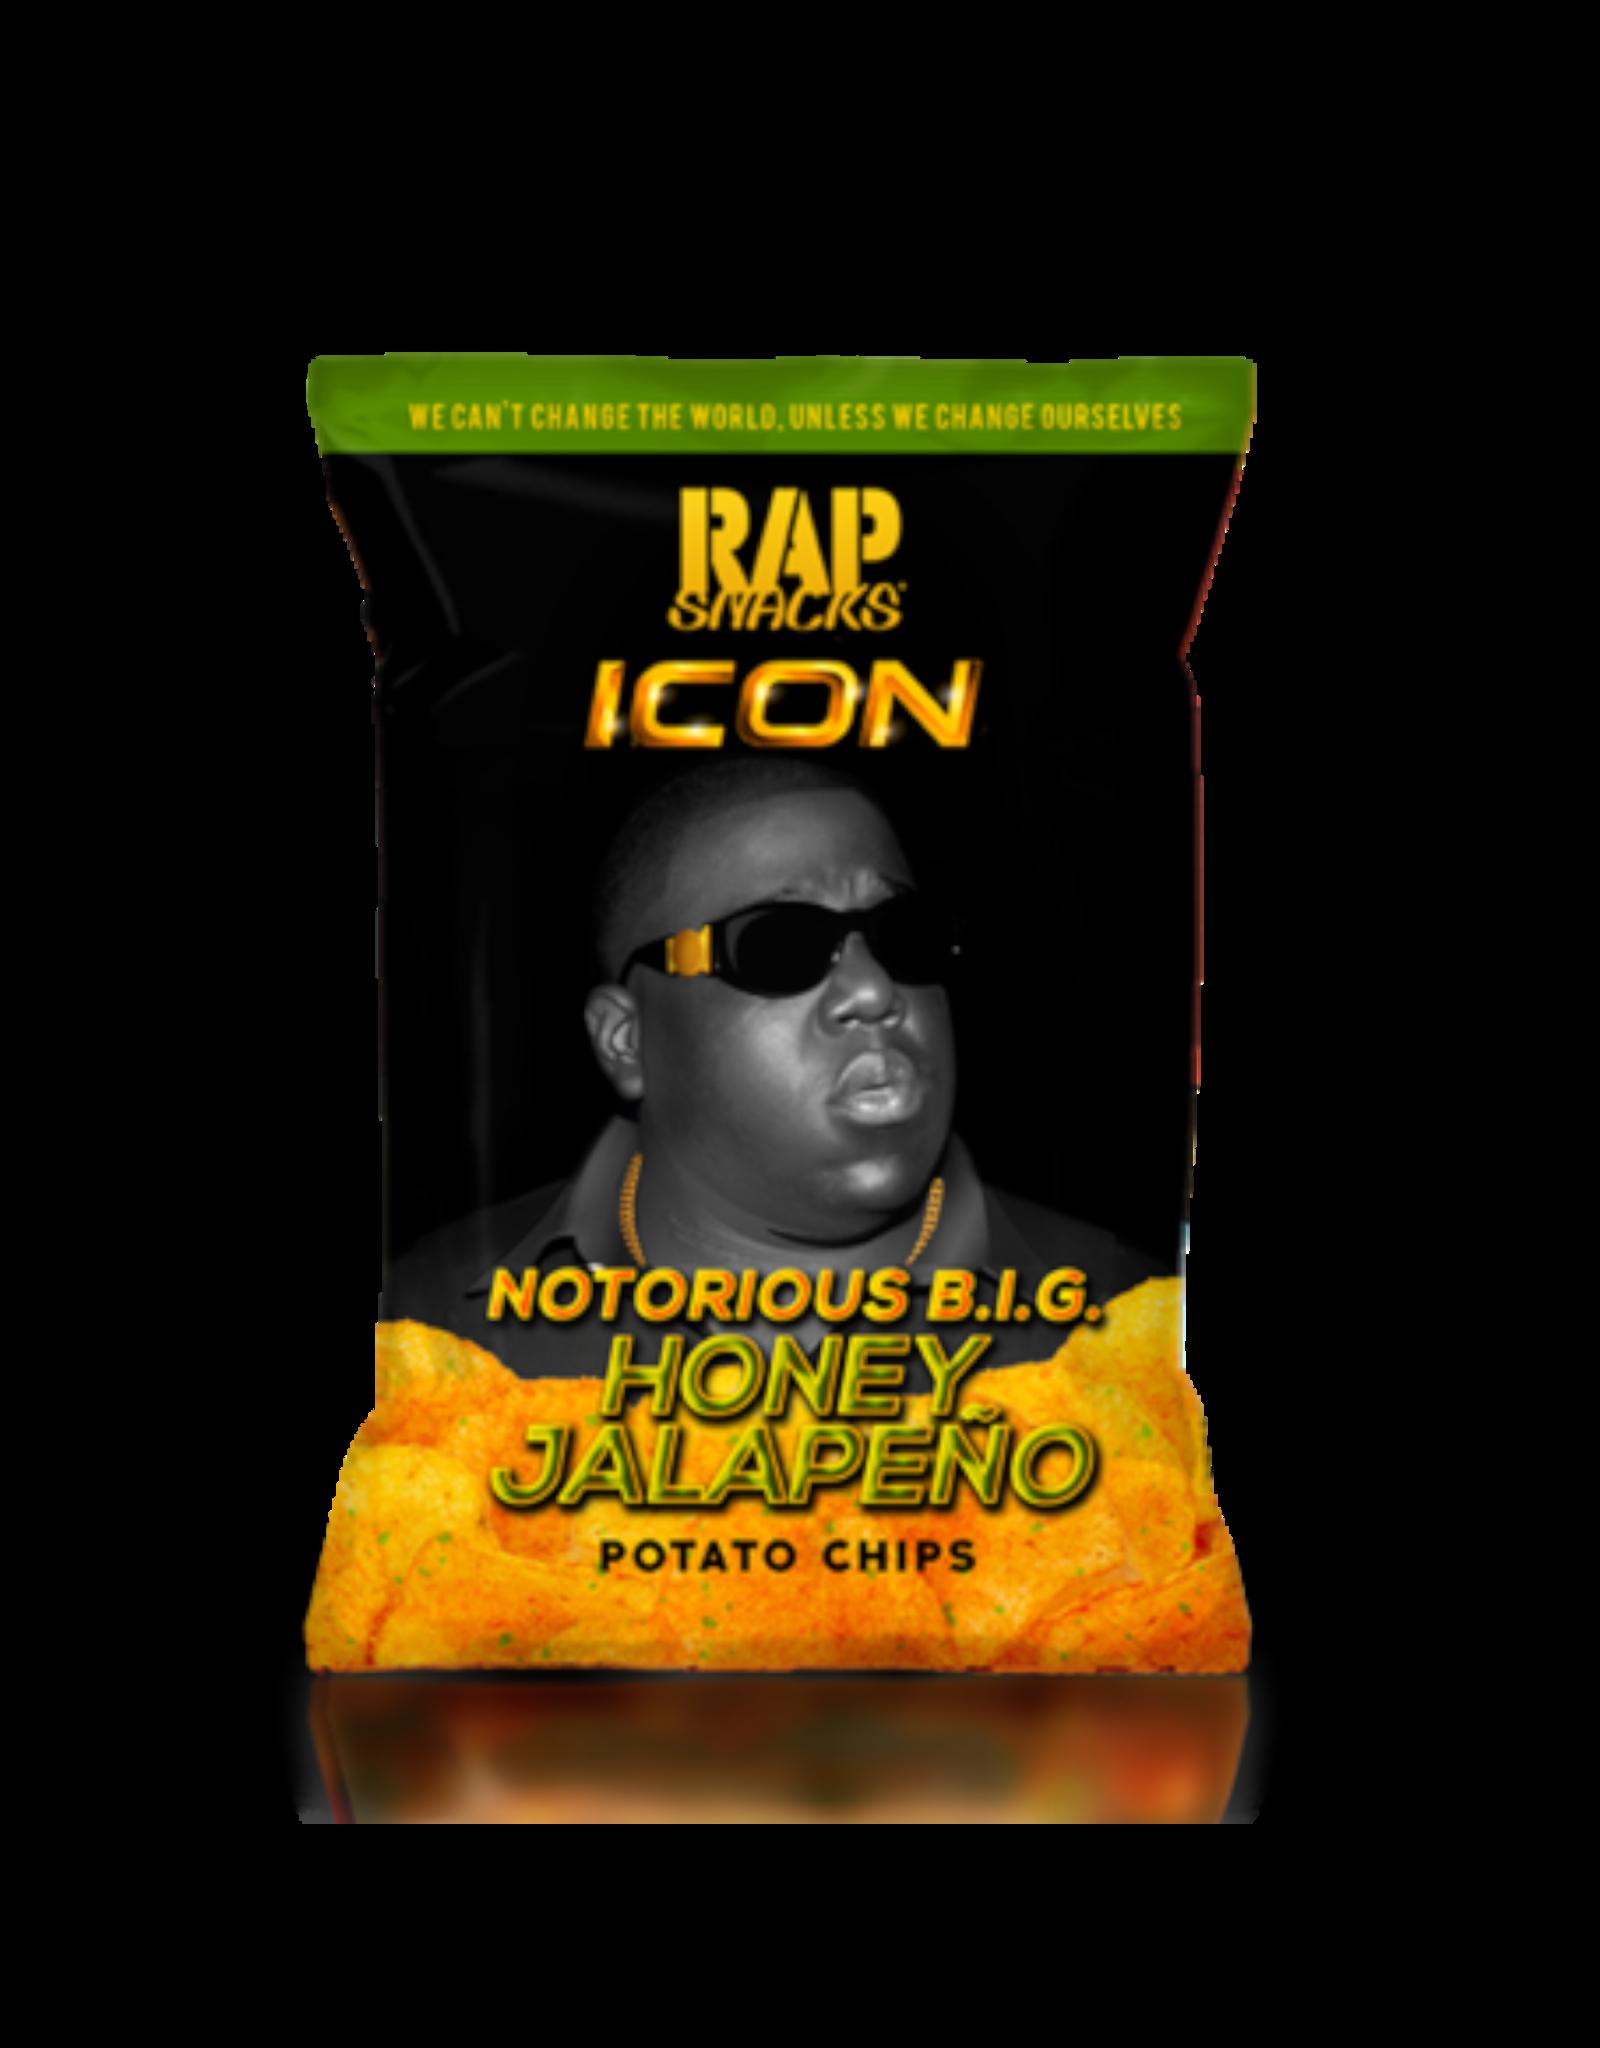 Rap Snacks ICON - Notorious B.I.G. - Honey Jalapeño Potato Chips - 78g